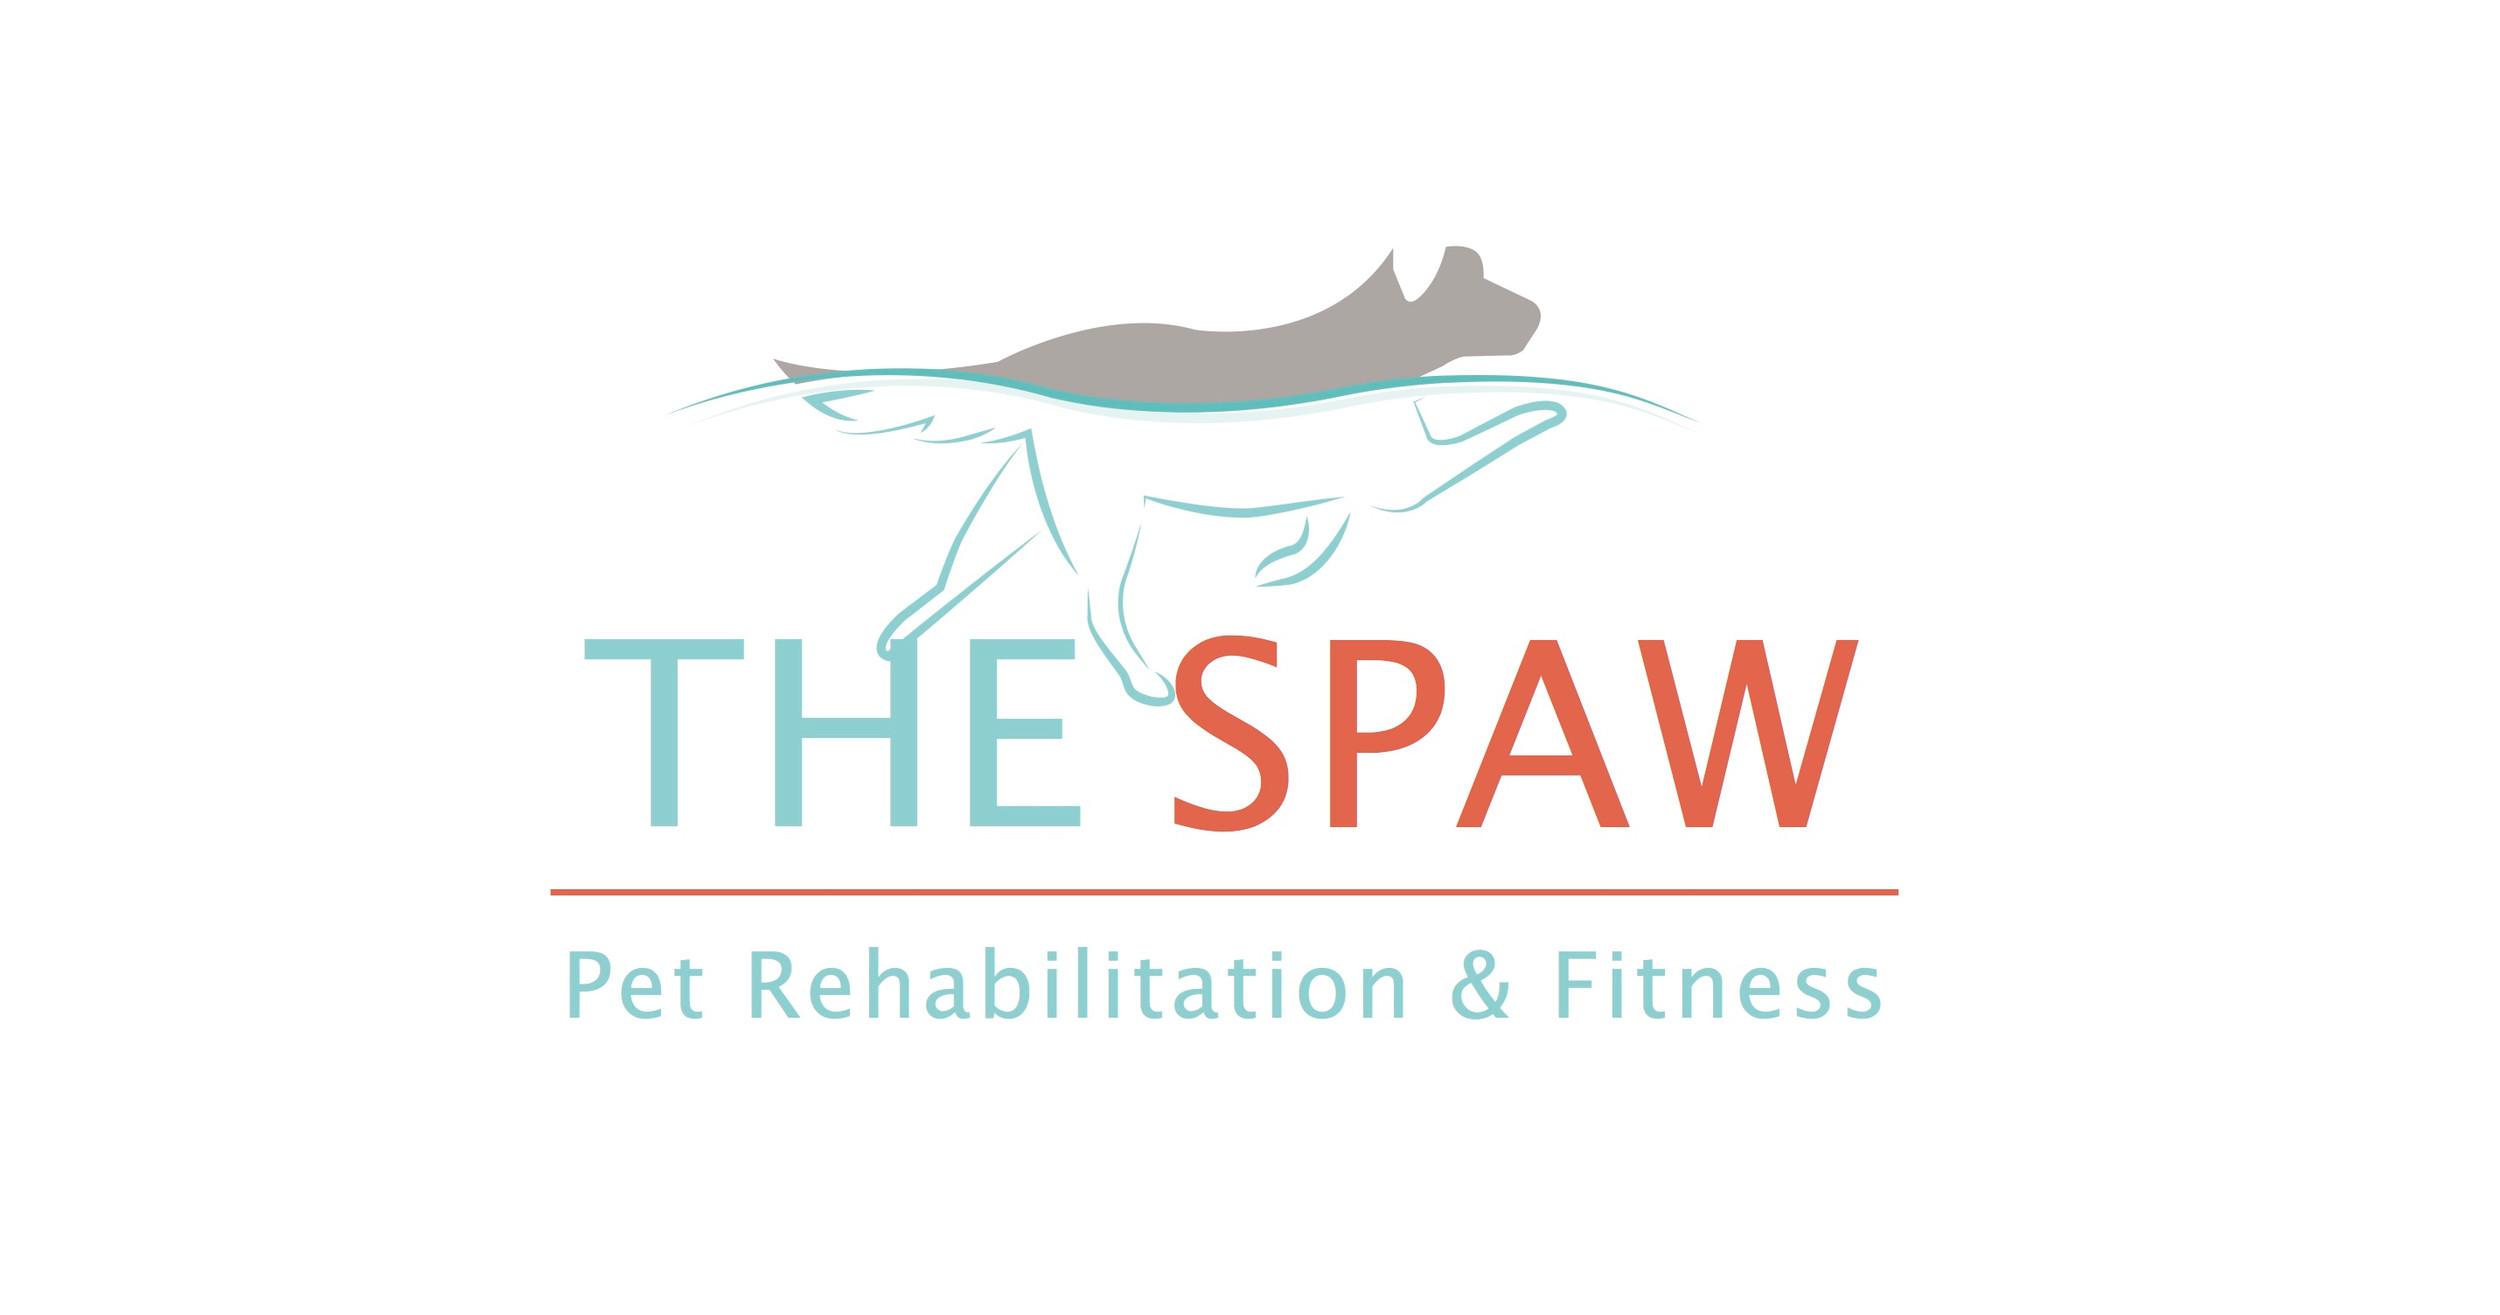 THE SPAW Pet Rehabilitation & Fitness logo